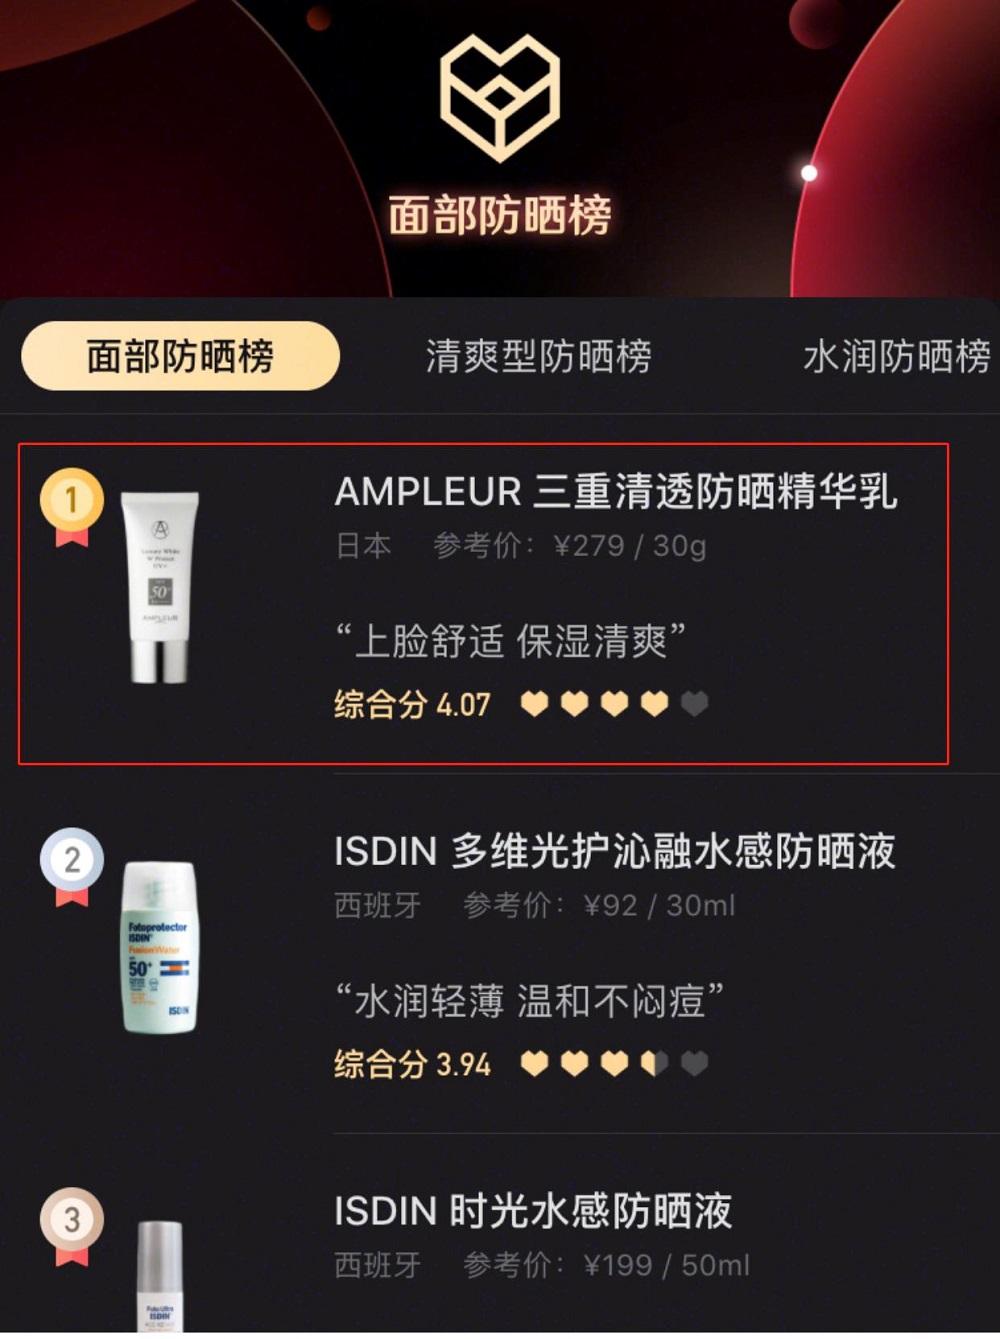 AMPLEUR品牌携手防晒代言人陈数 耀白四季